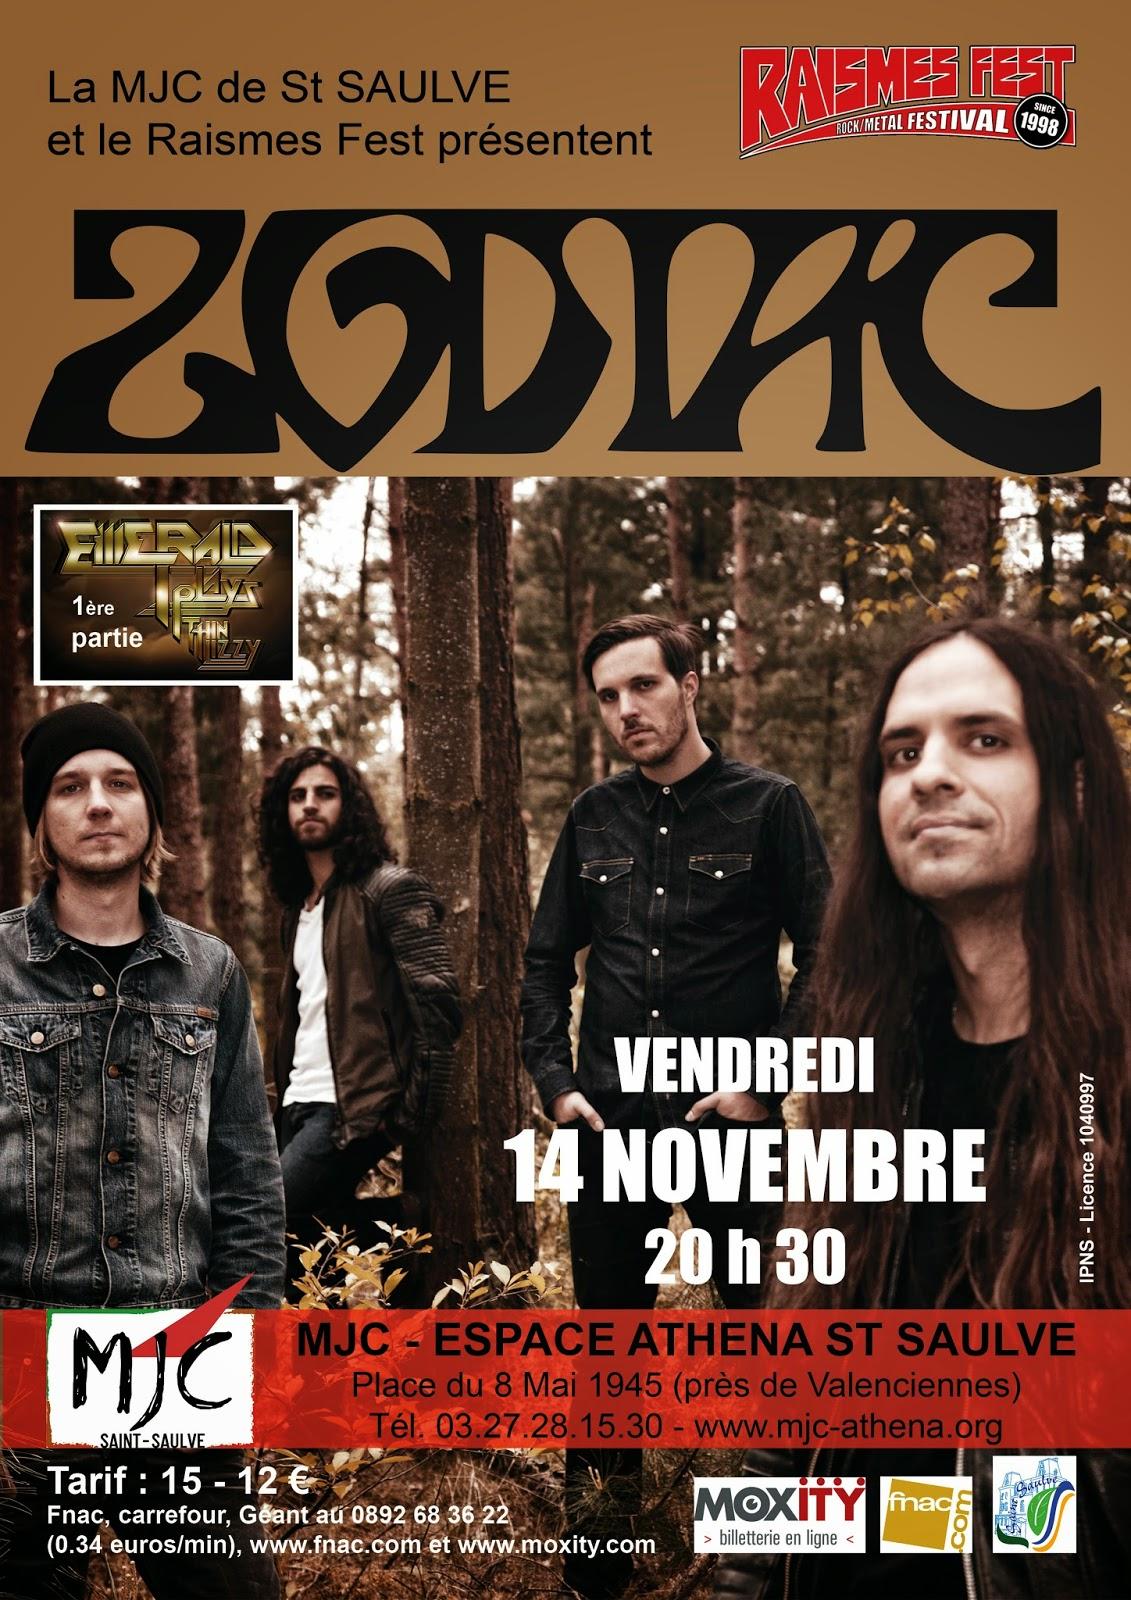 http://bluesinathena.blogspot.fr/2014/10/zodiac-emerald-14-novembre-2014-20-h30.html